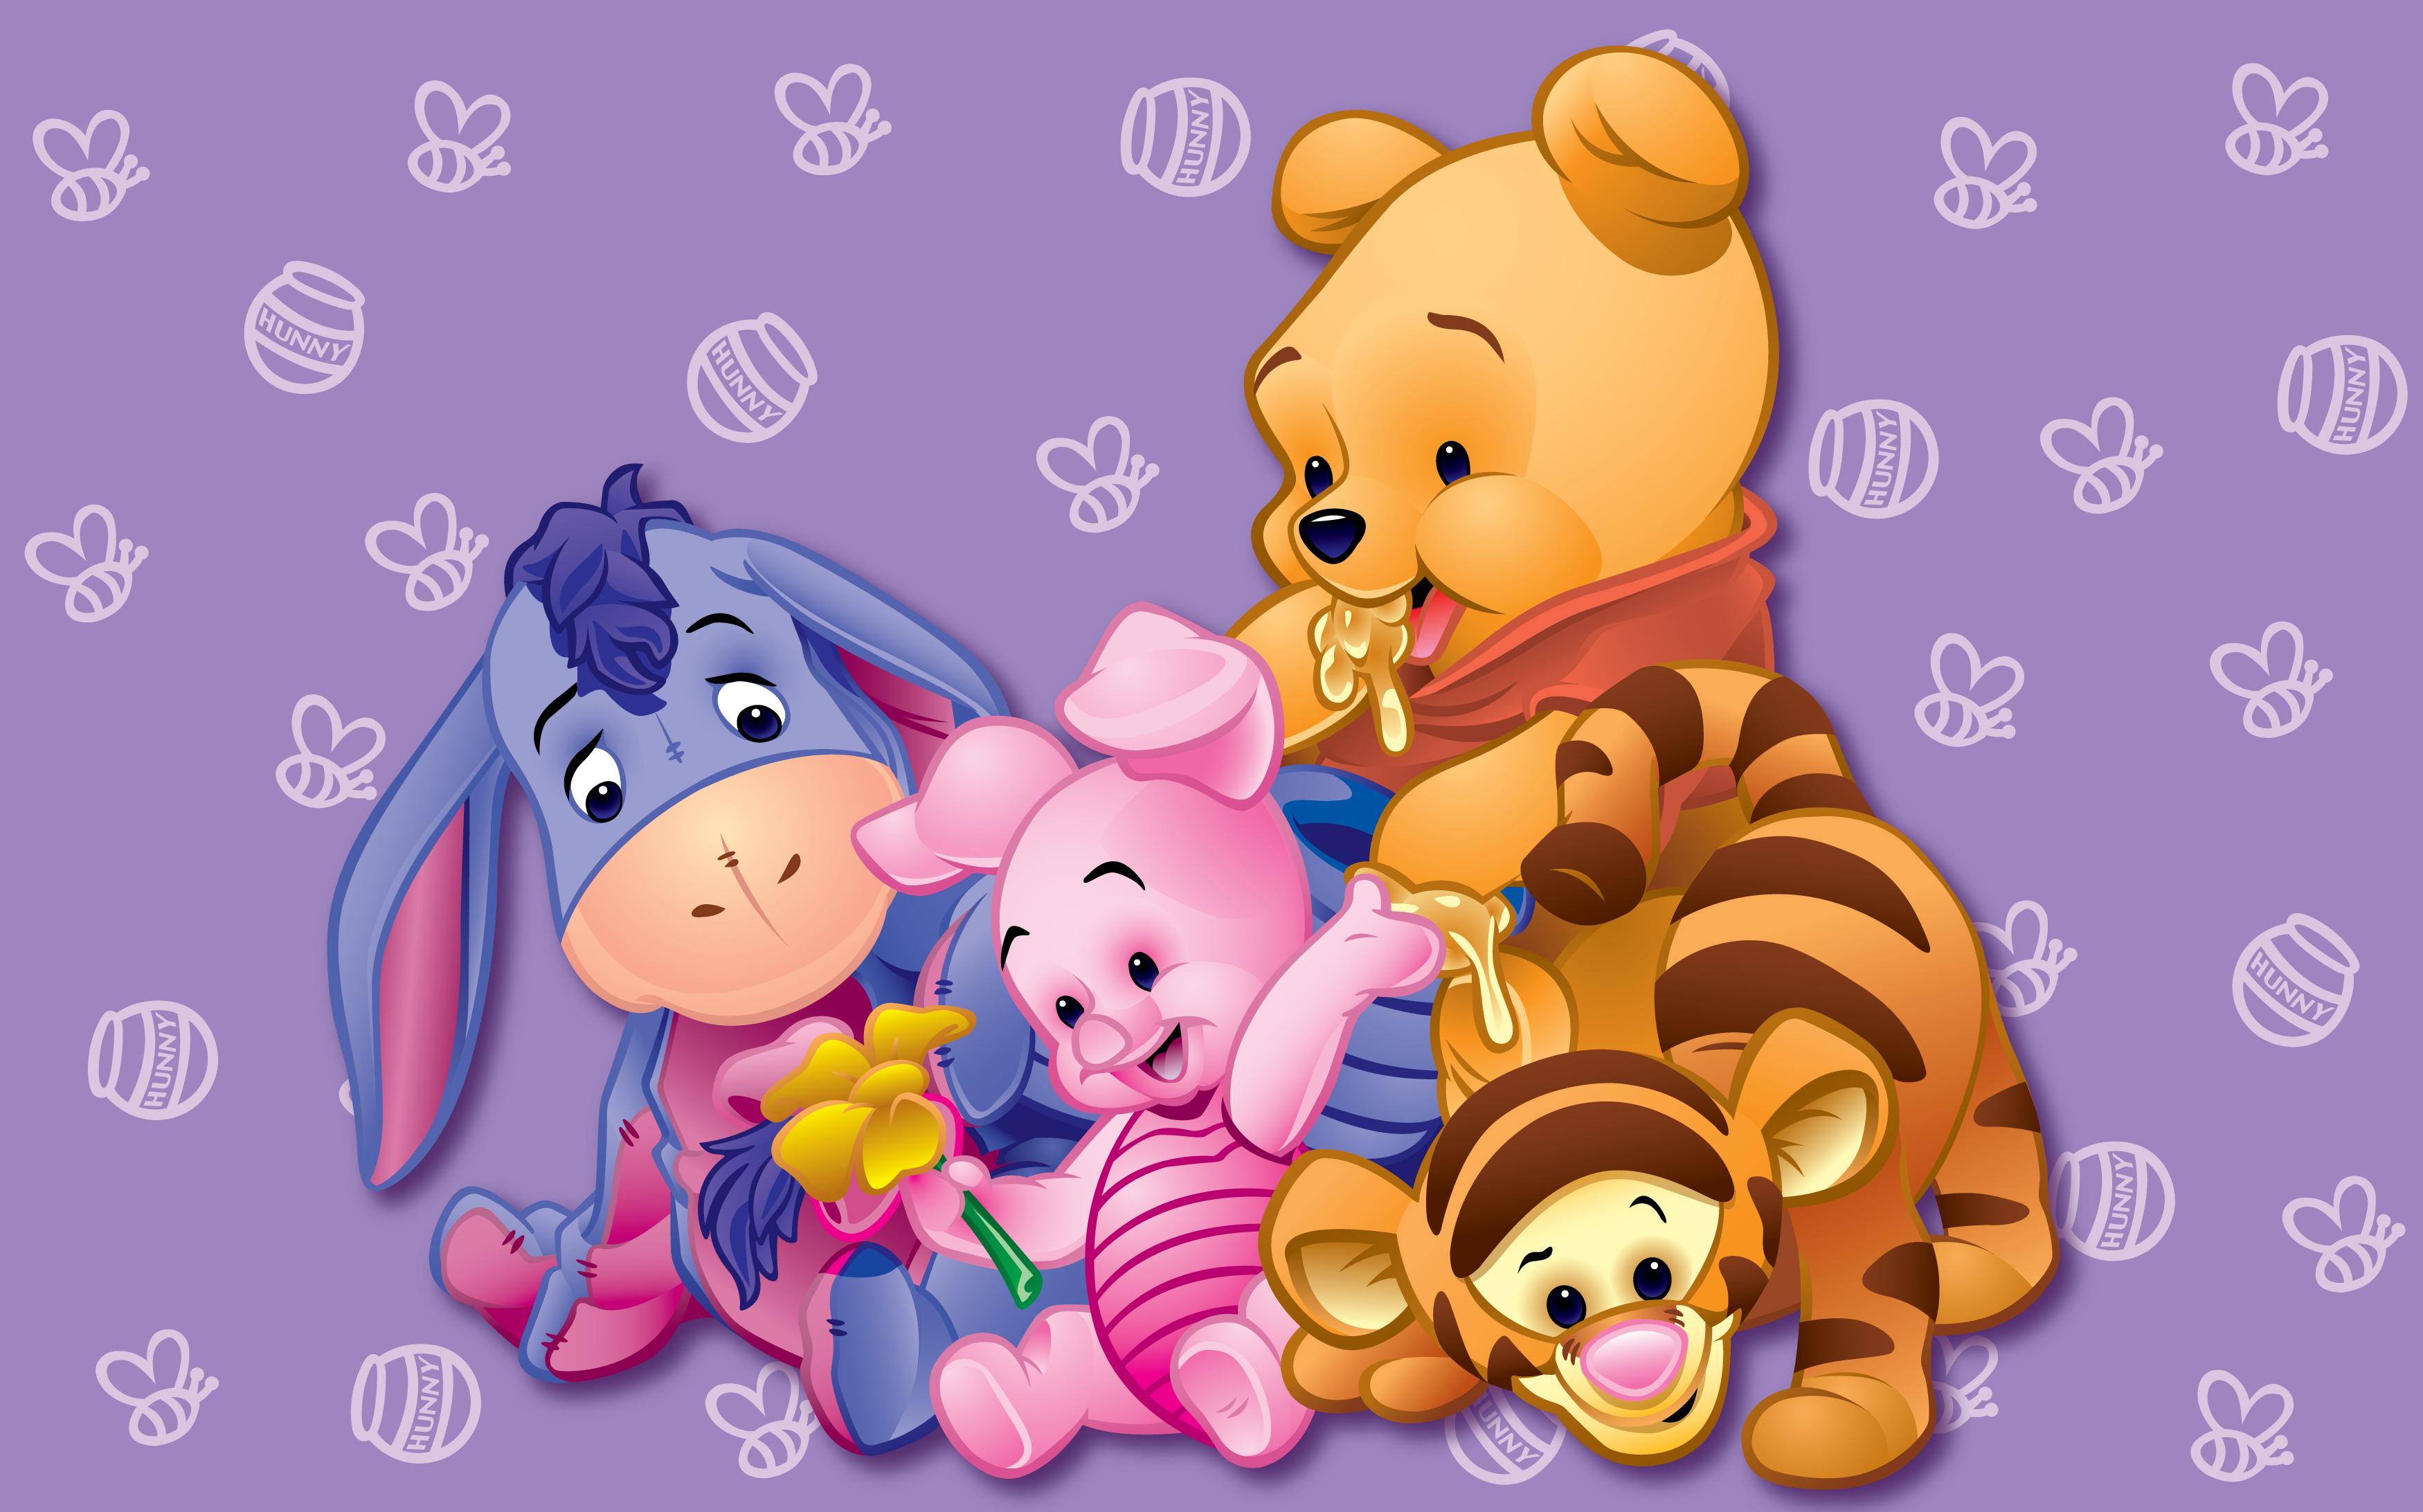 Baby Disney Characters Wallpaper 3500x2184